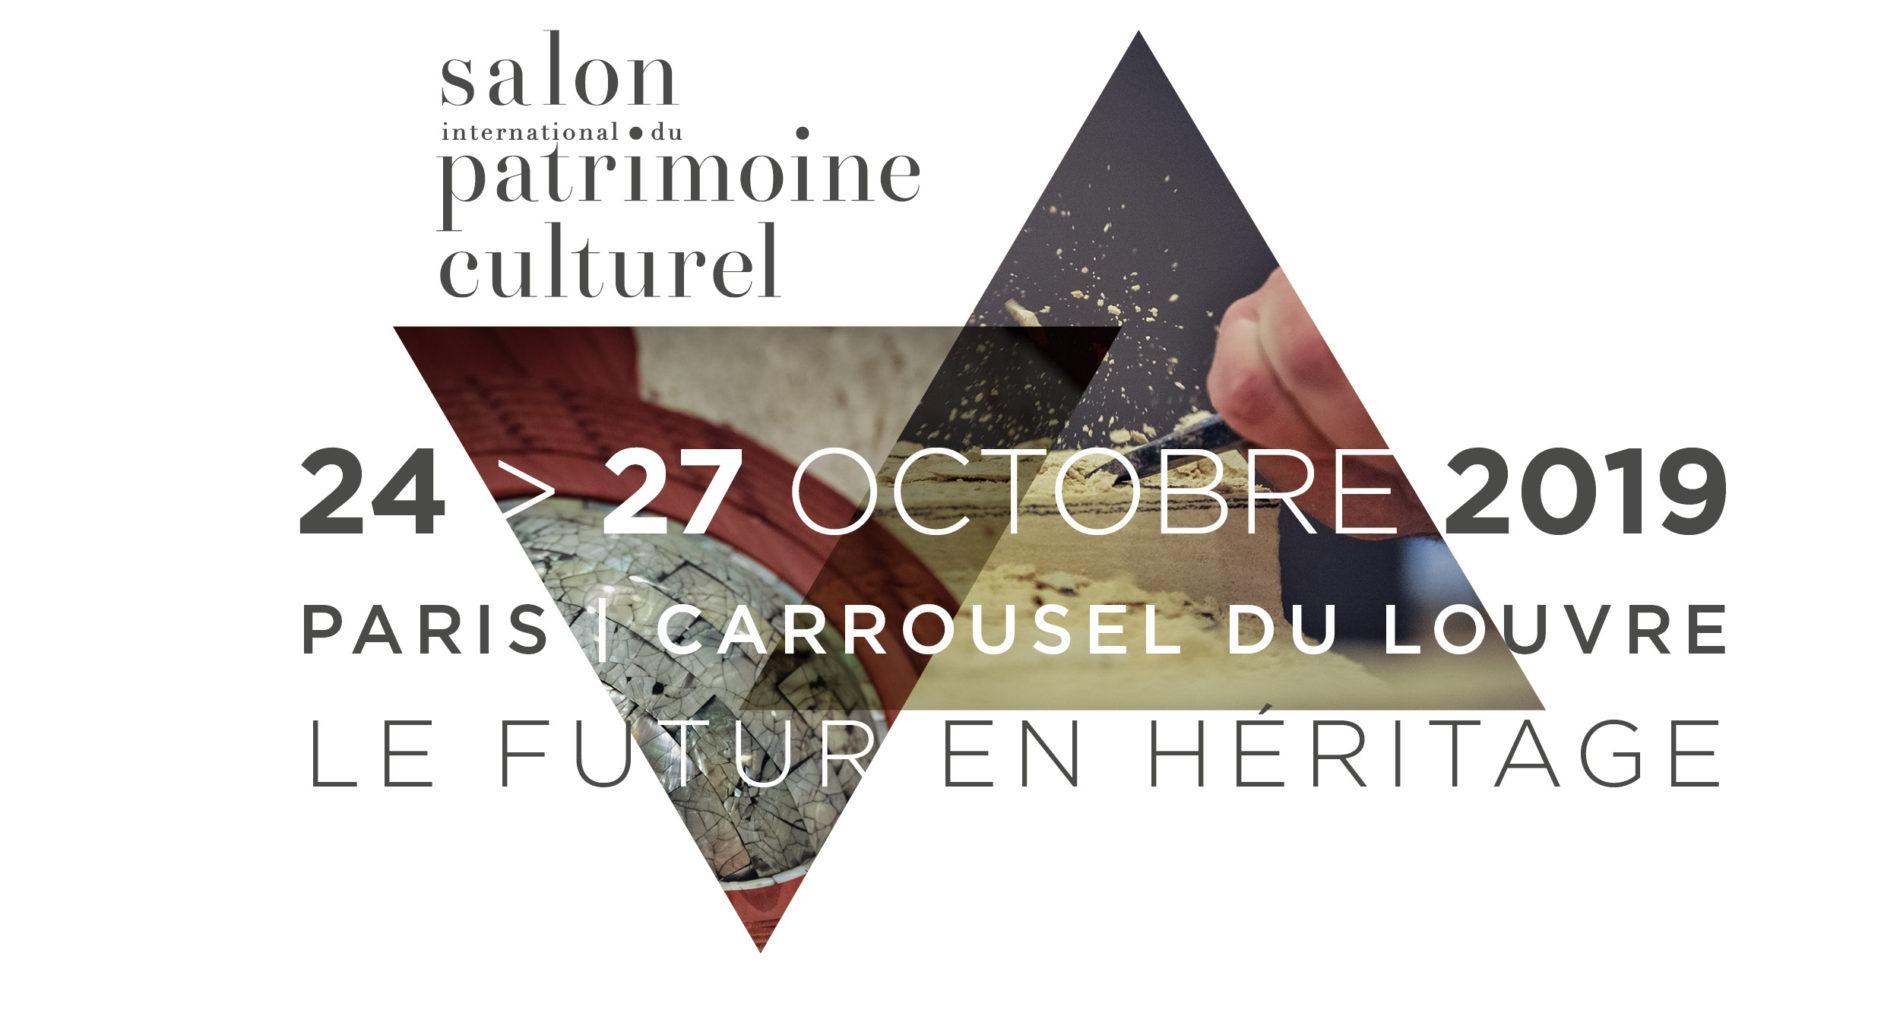 Salon international du patrimoine 2019